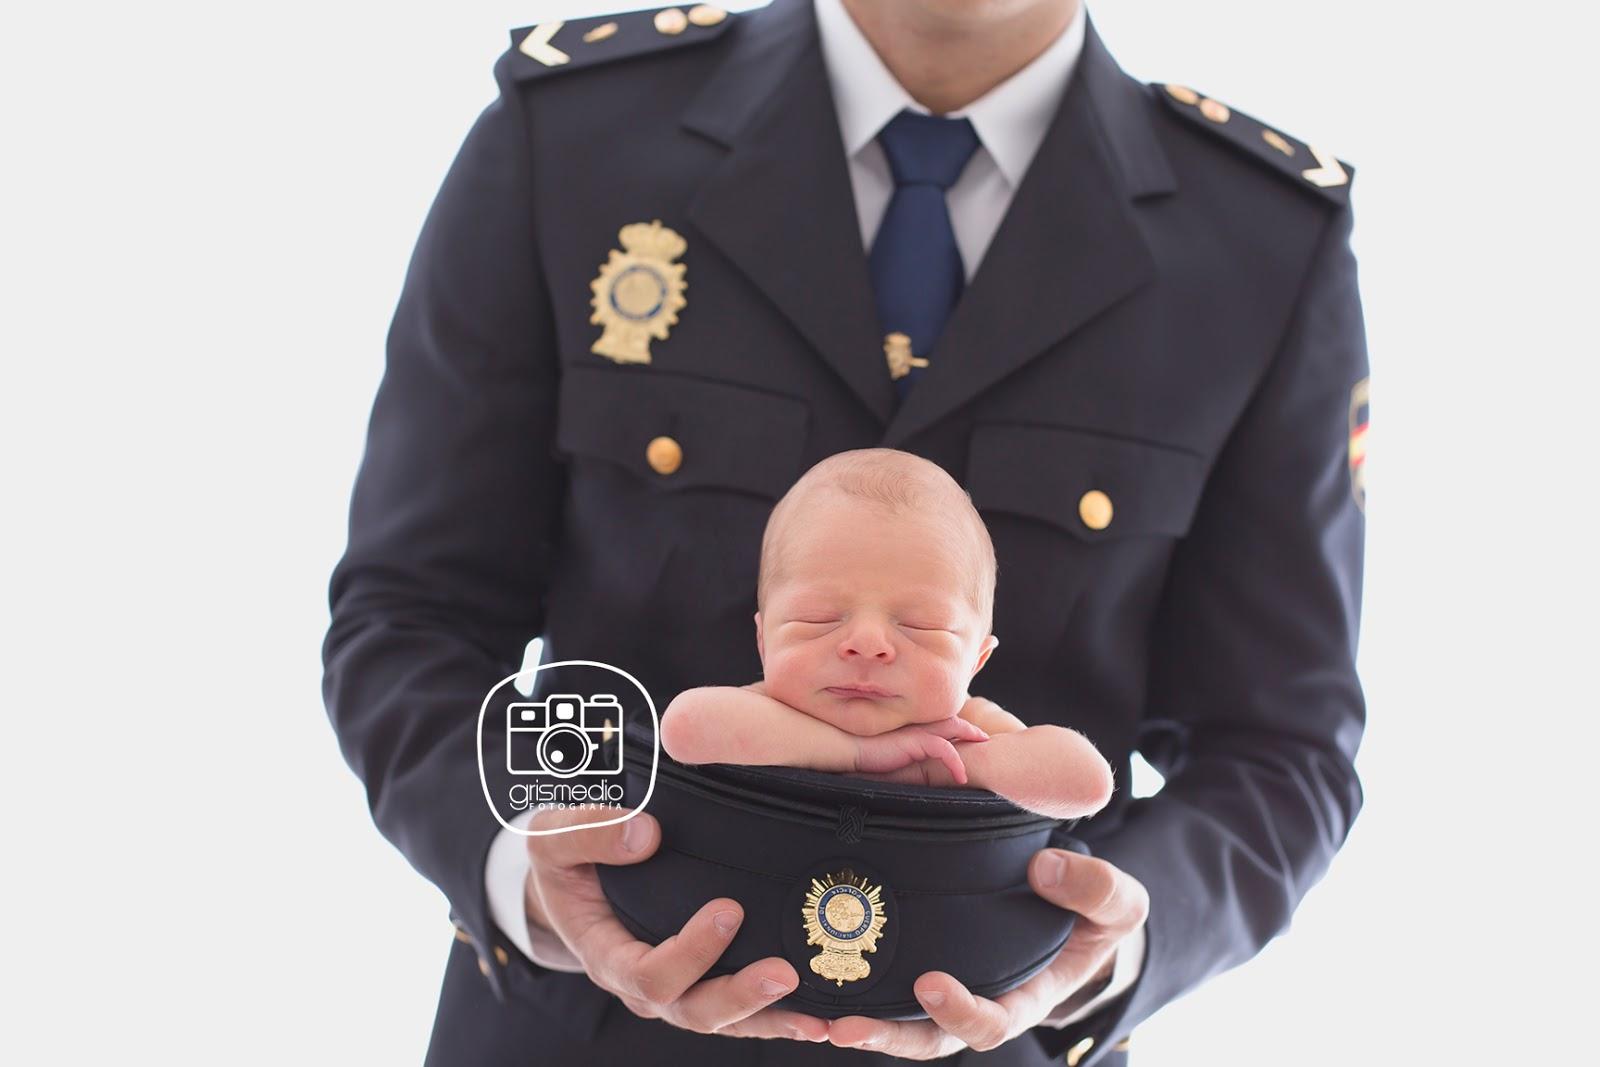 fotografia-especializada-recien-nacido-en-zaragoza-uniforme